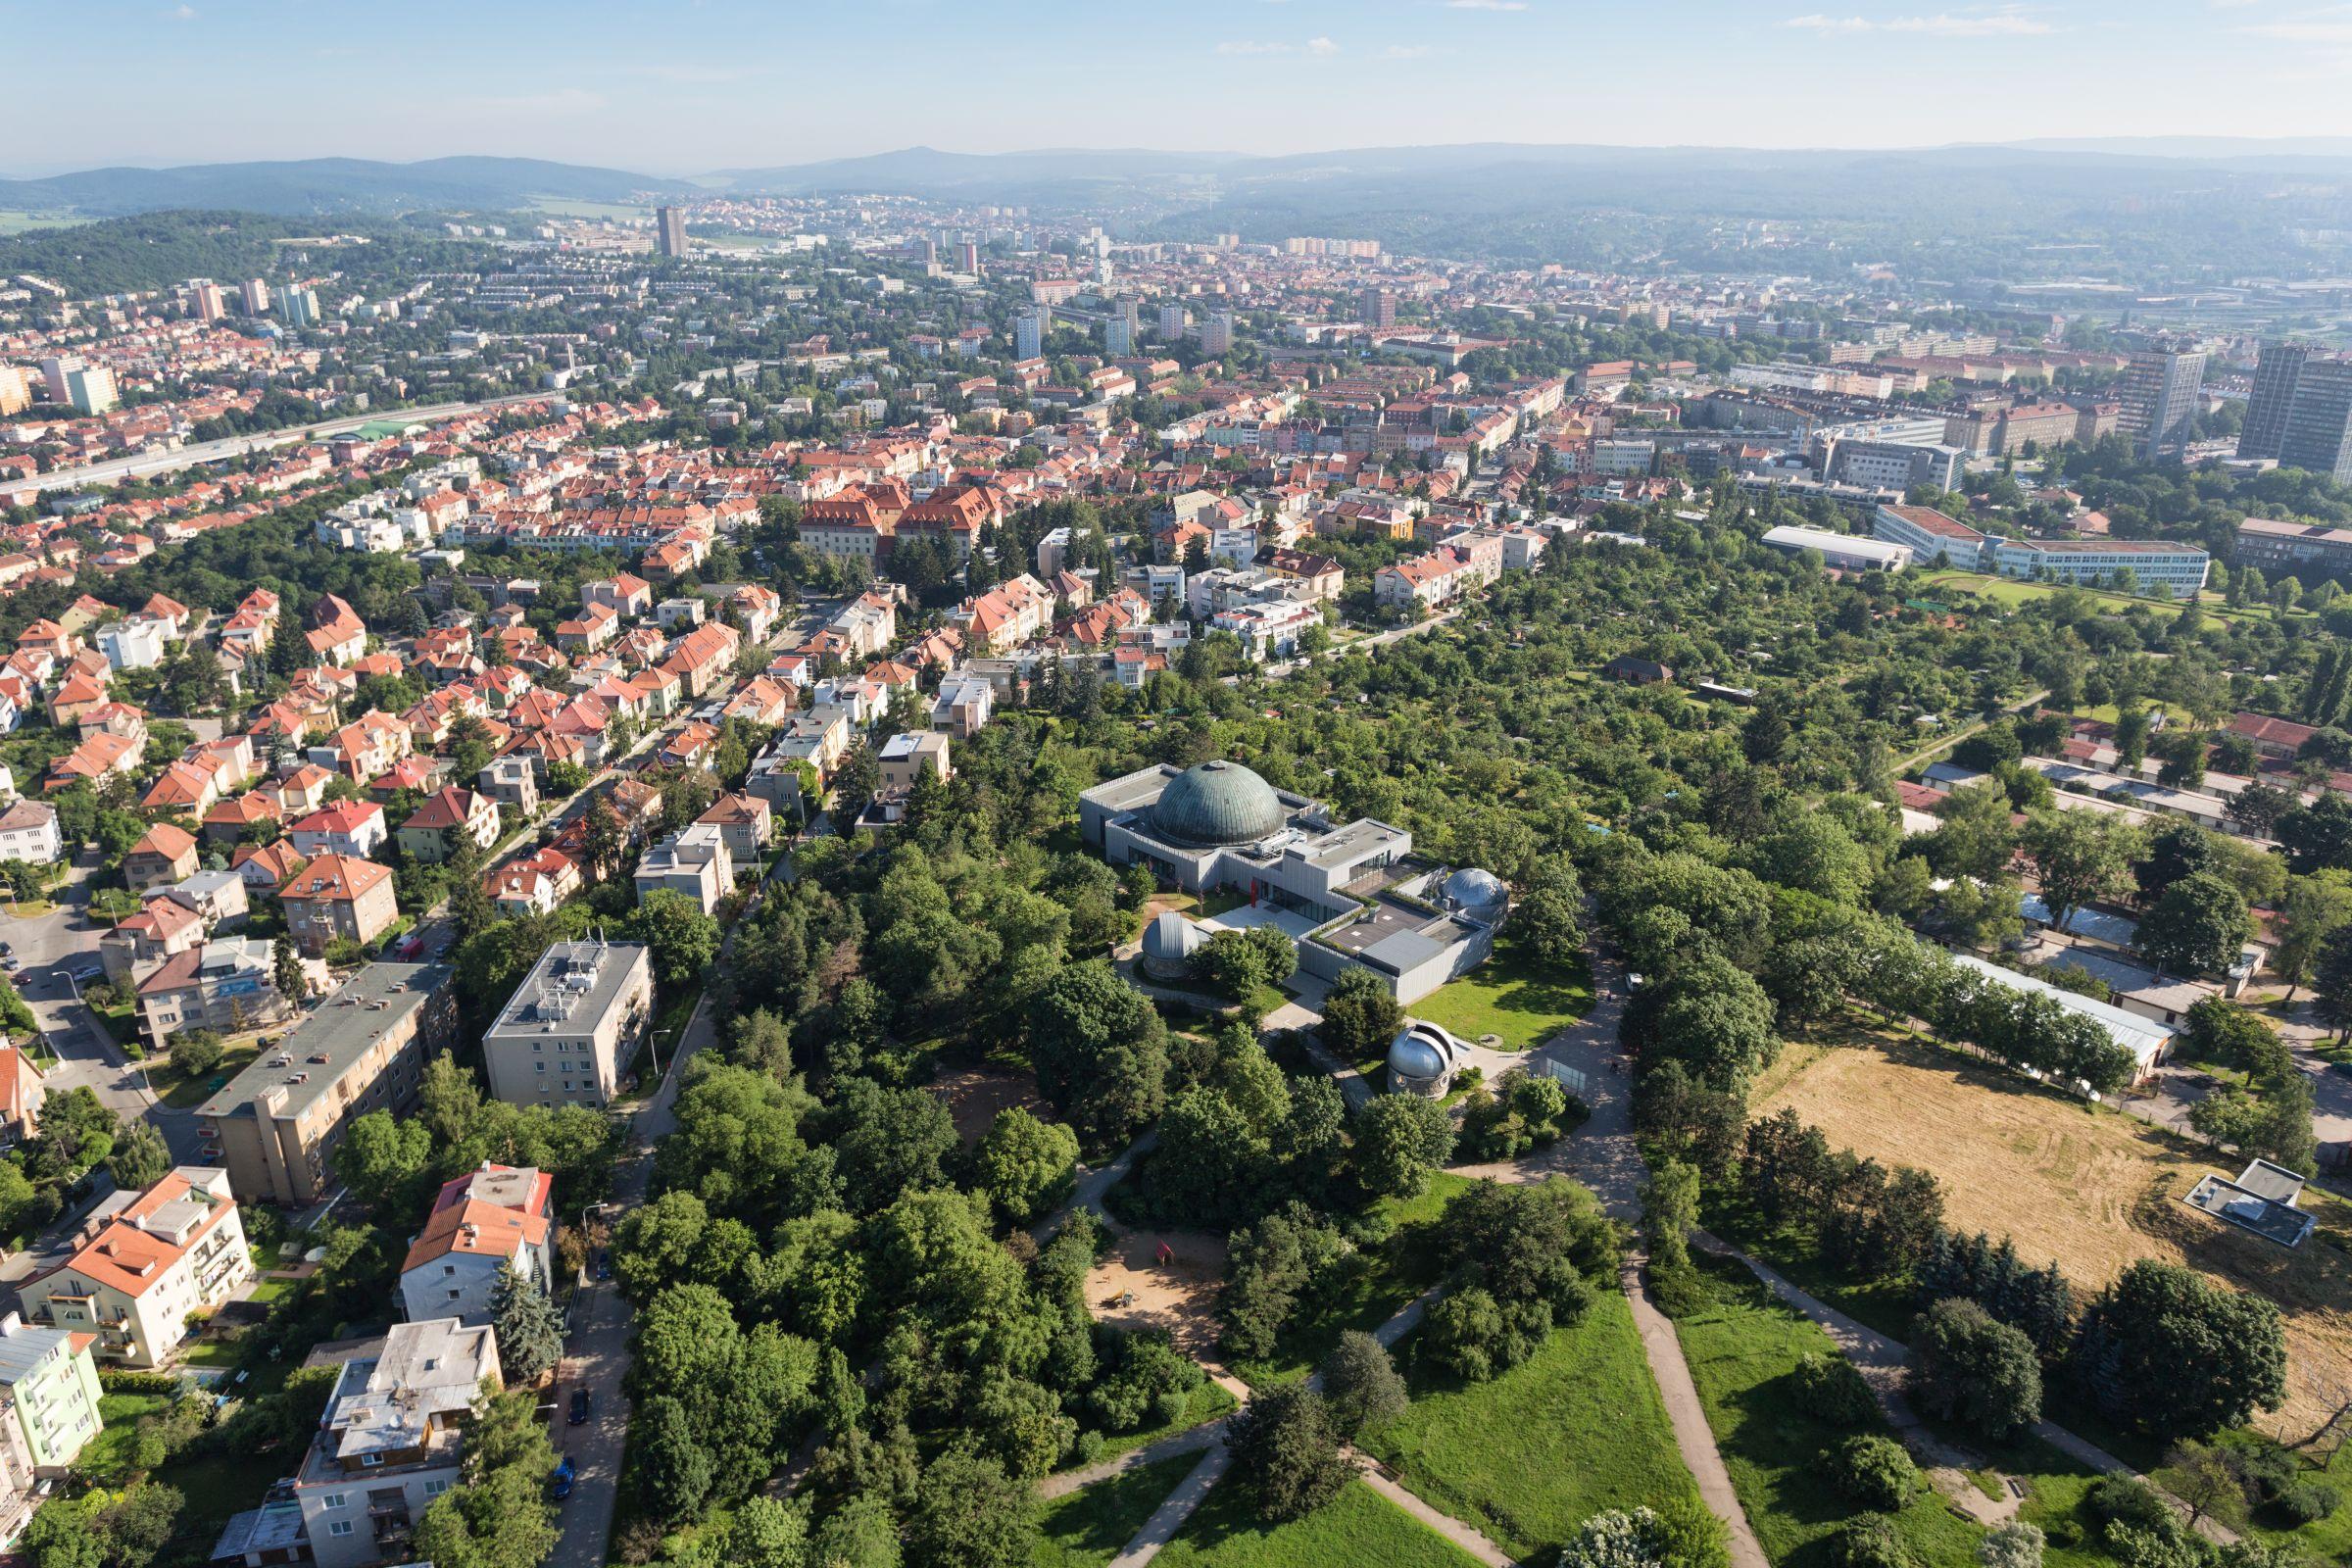 Brno Observatory and Planetarium